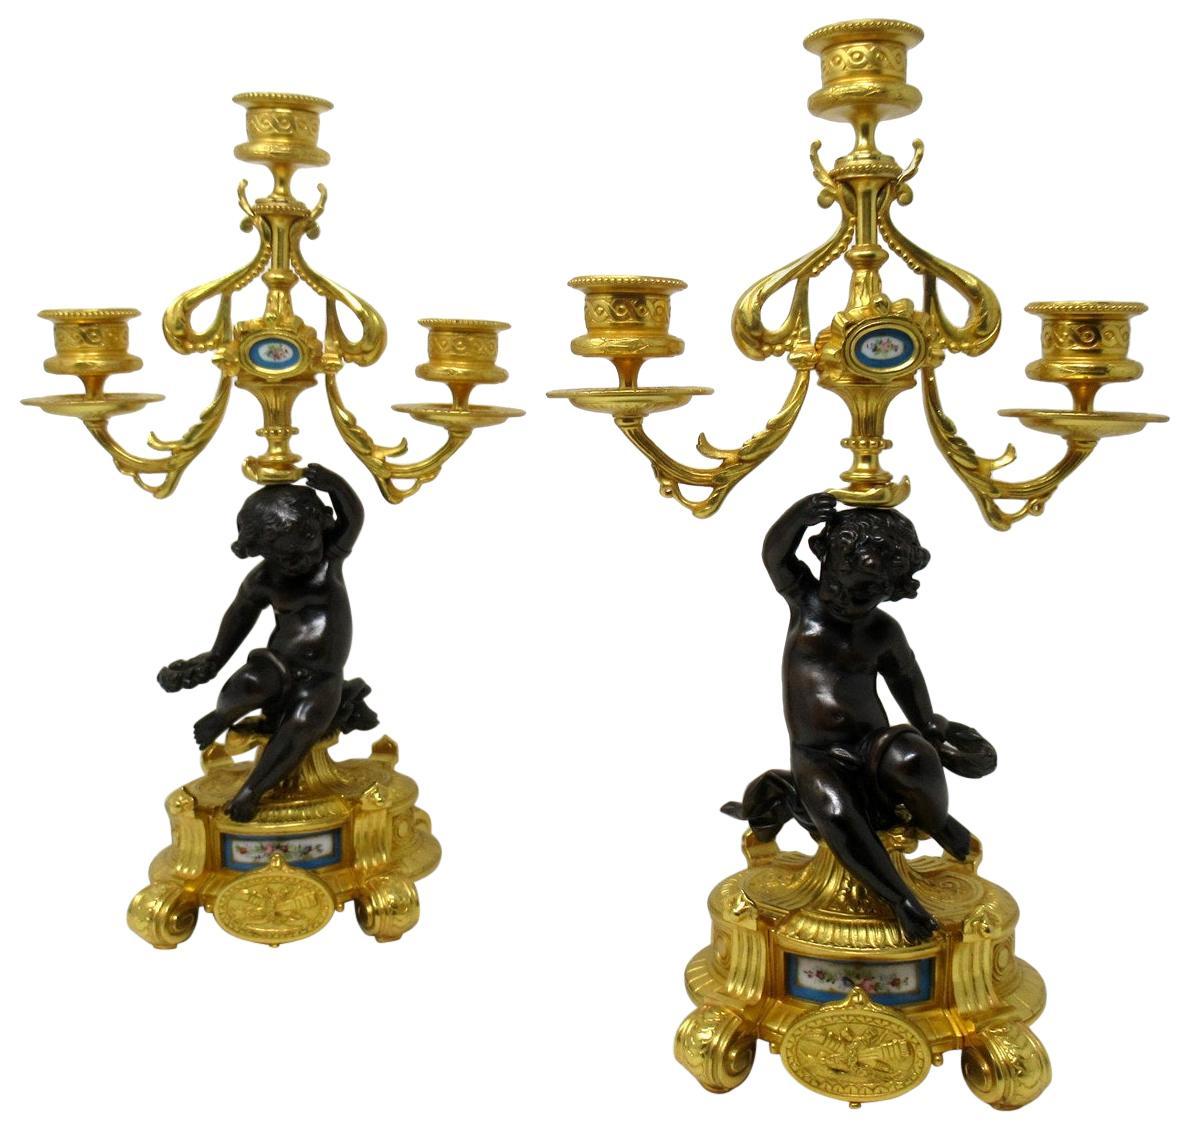 Antique Pair of Sèvres Porcelain Gilt Bronze Cherub Candelabra Candlesticks